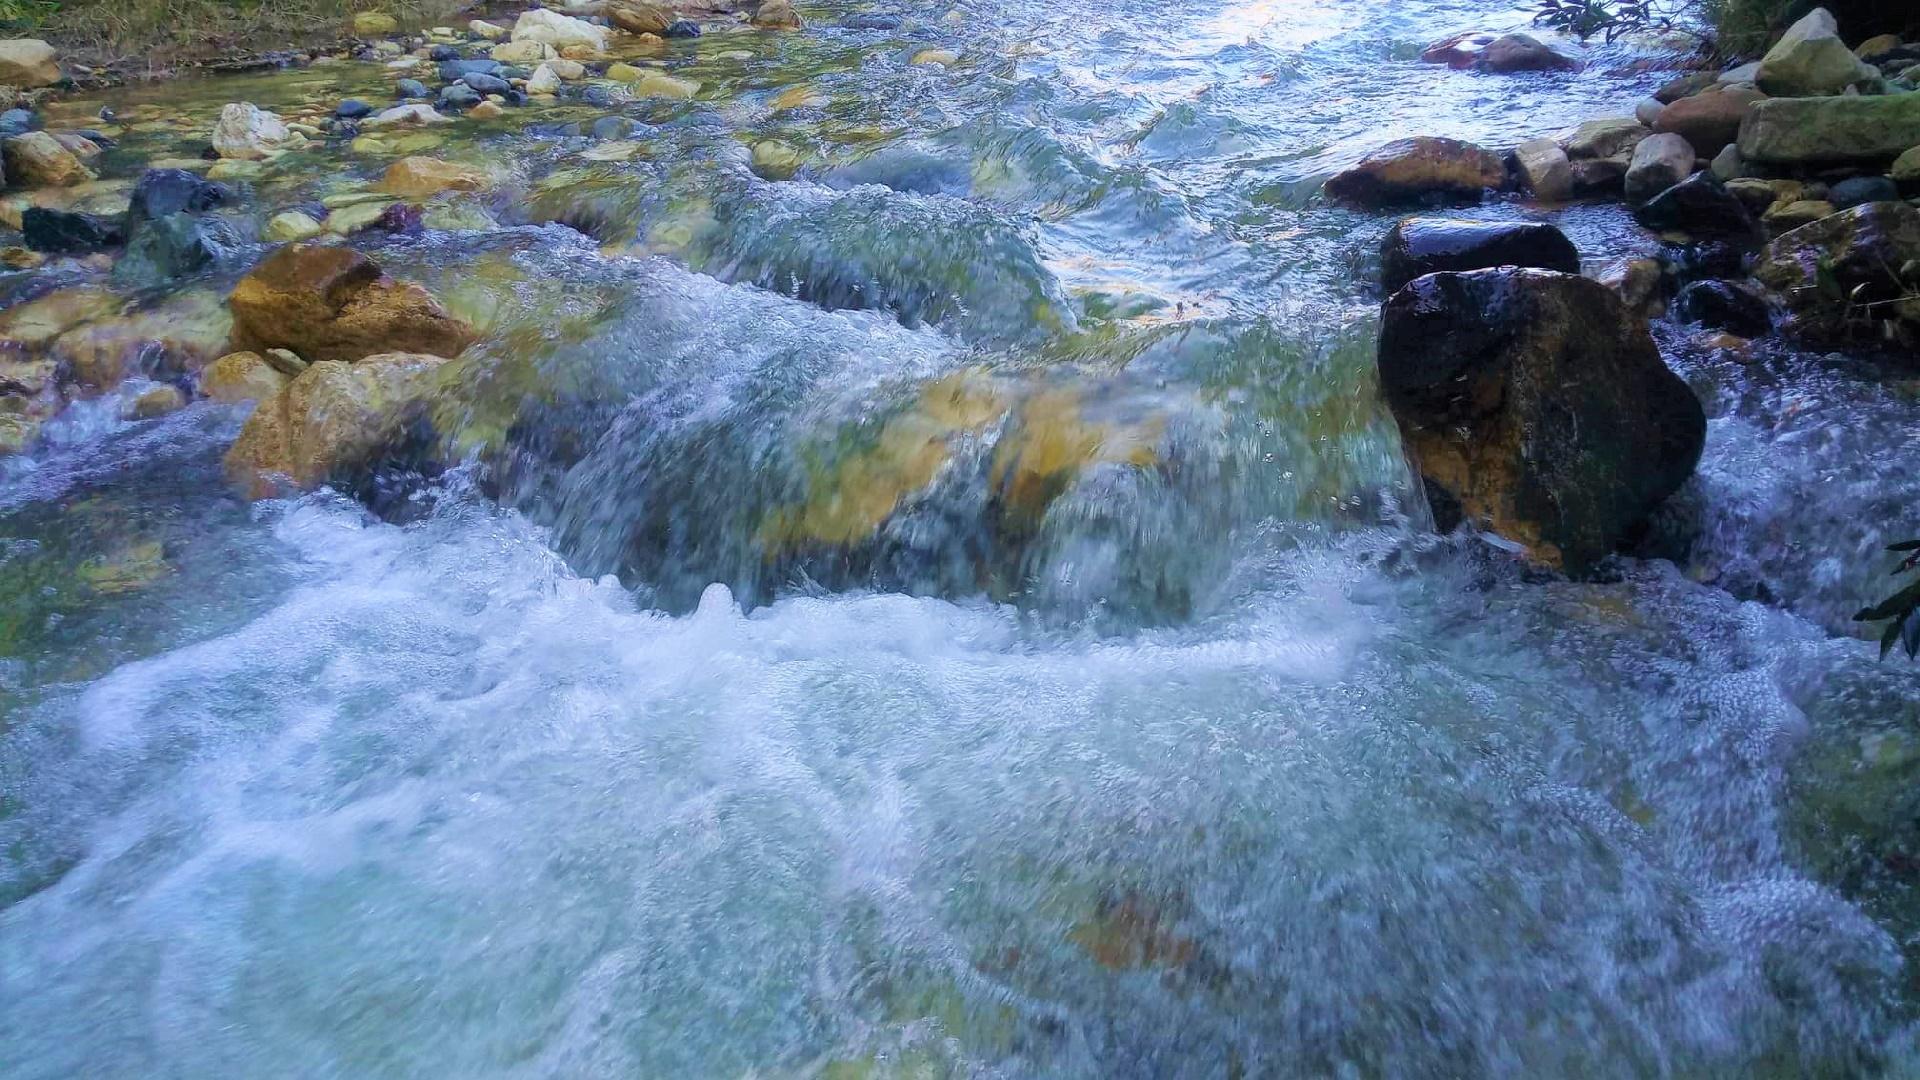 The River wallpaper